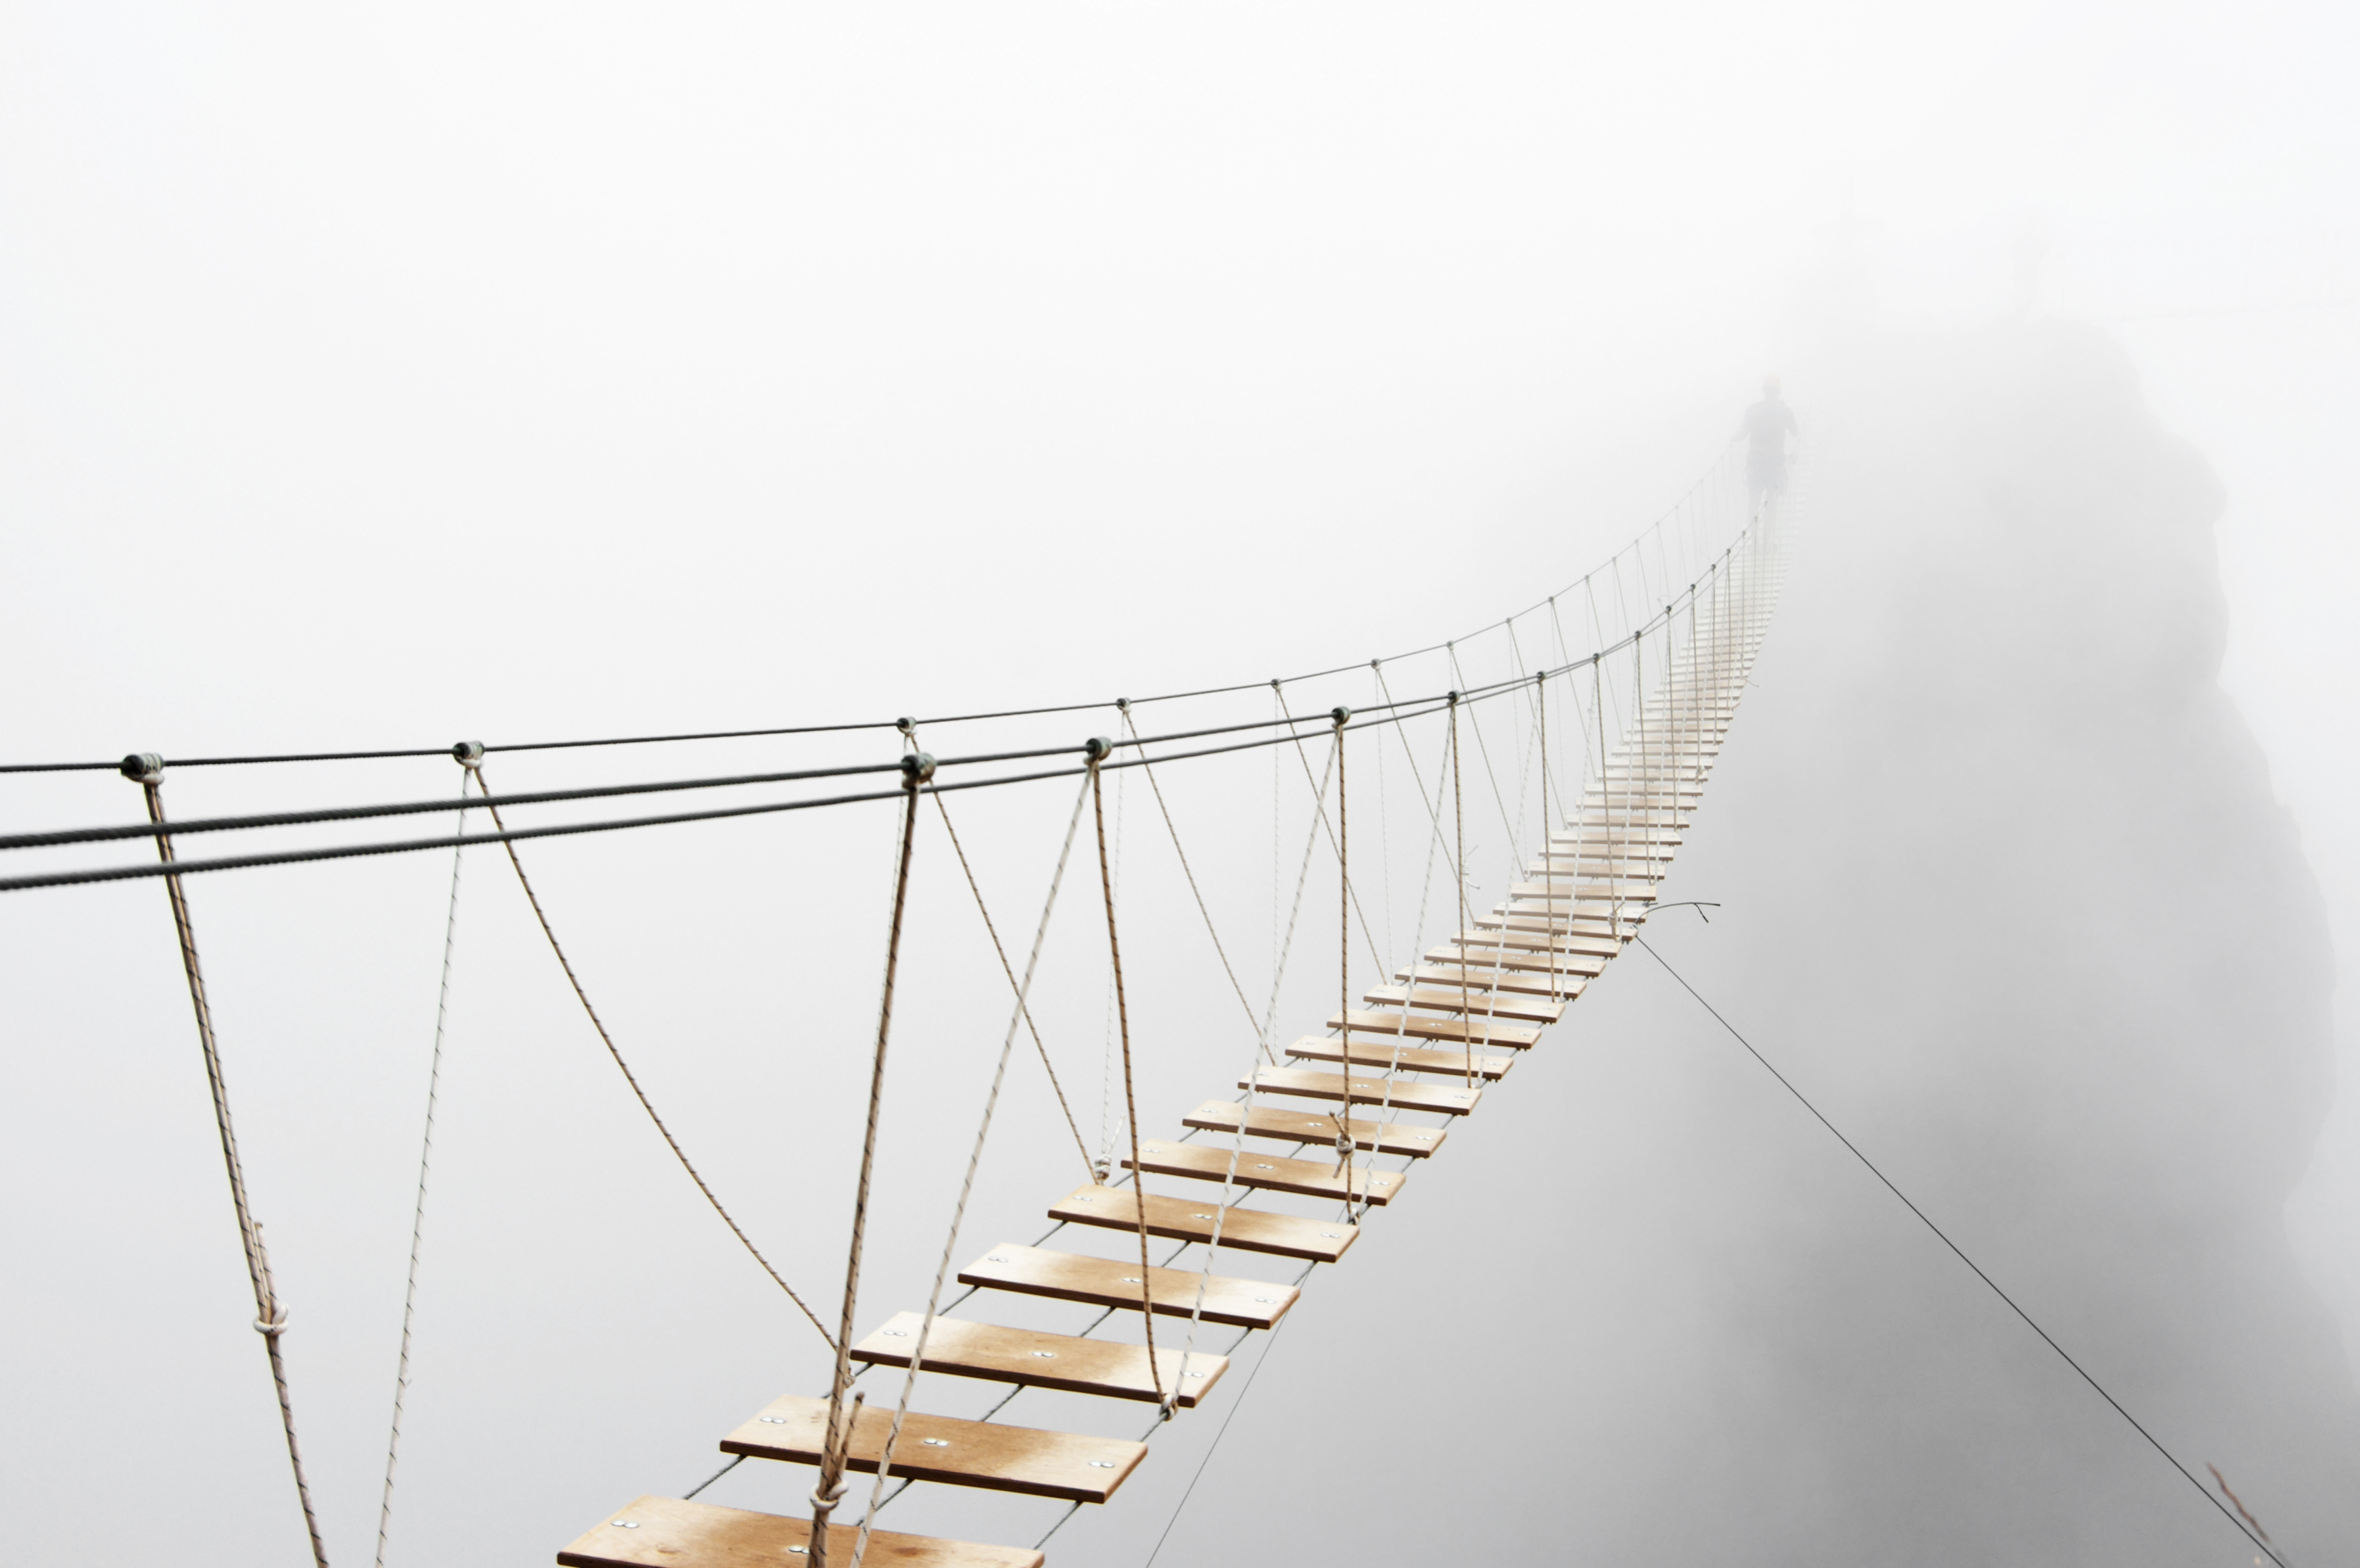 Rope Bridge over Mist